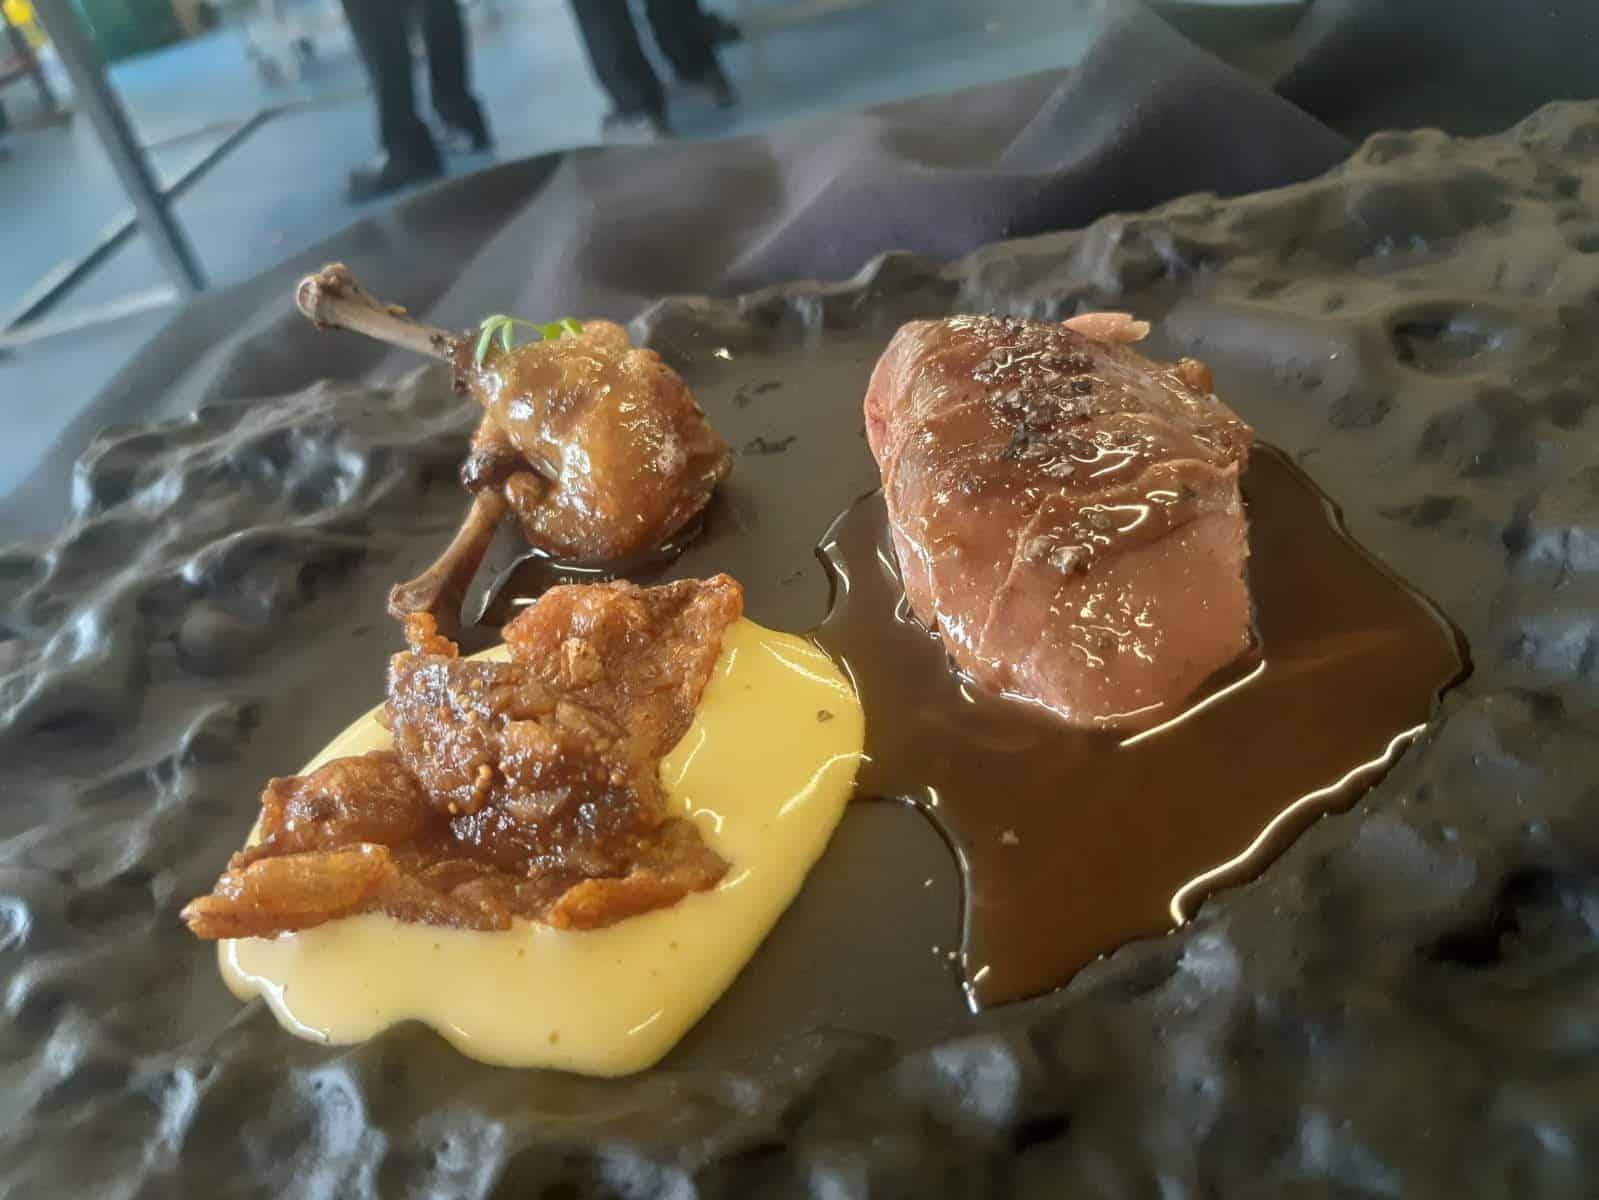 escuela-cocina-villa-retiro-cursos-chef-marianzo-gonzalvo--fran-lopez-estrella-michelin-practicas-cocina